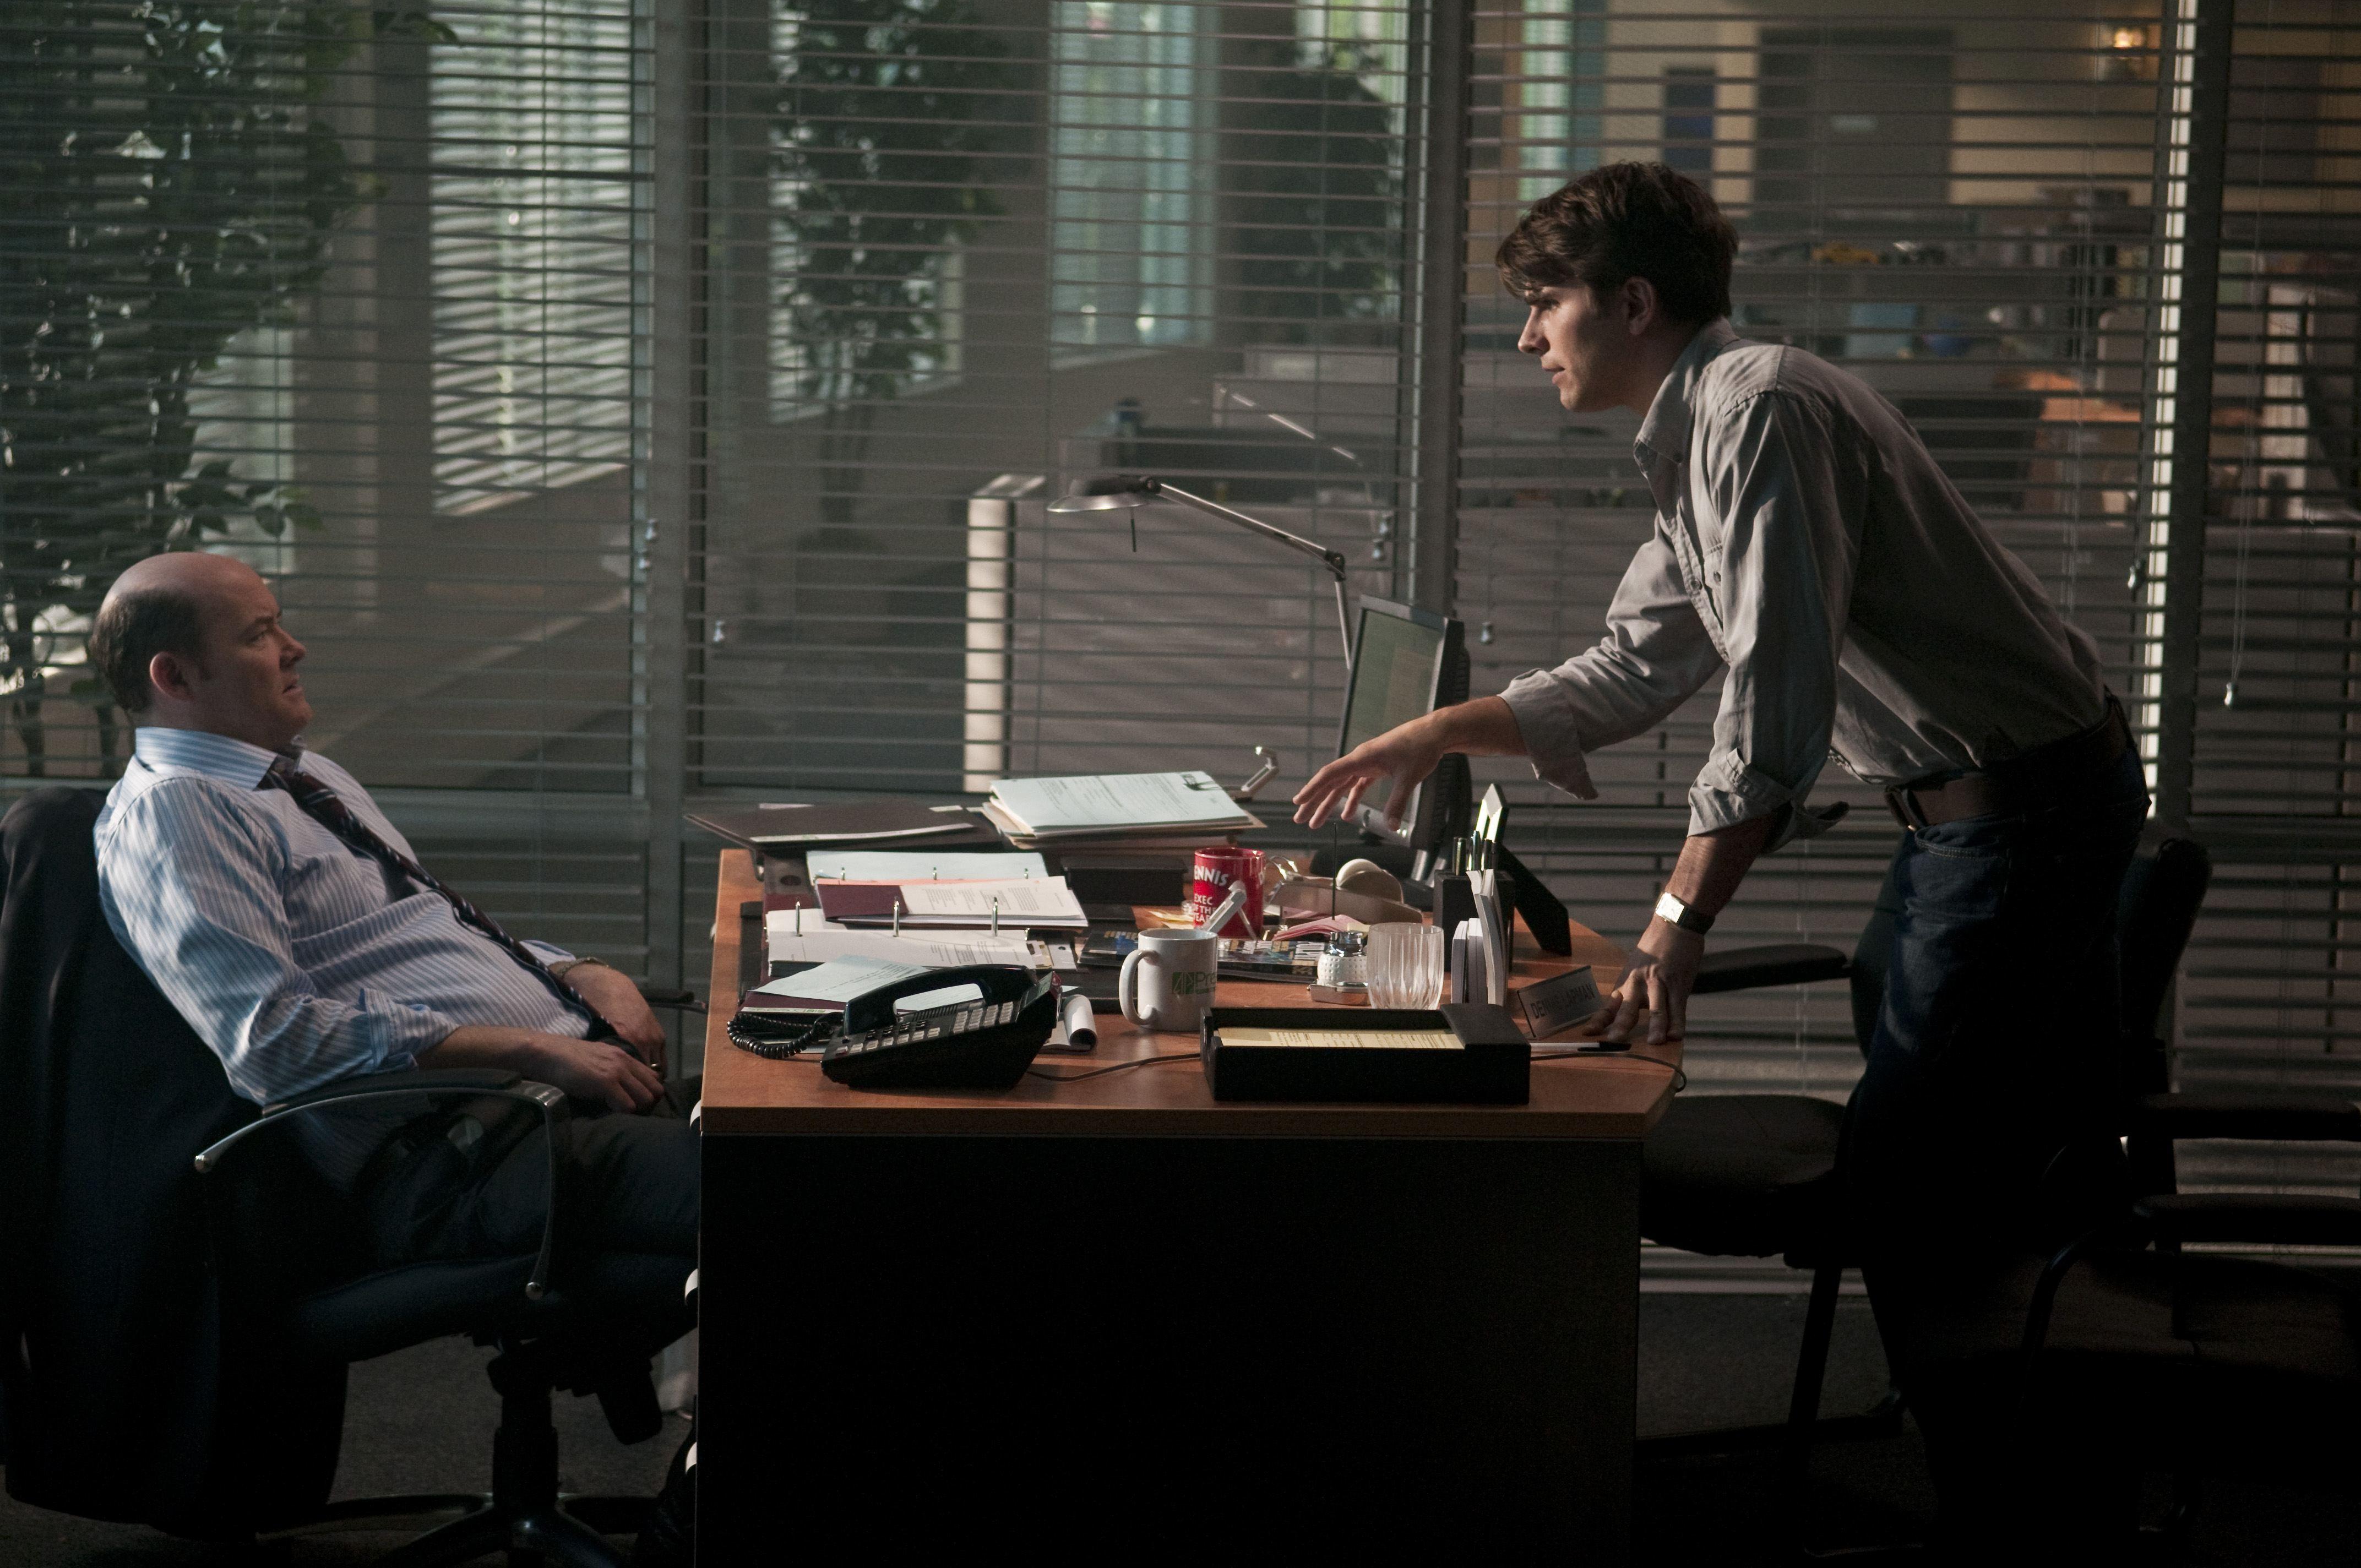 кадры из фильма Пункт назначения 5 Дэвид Кекнер, Майлс Фишер,